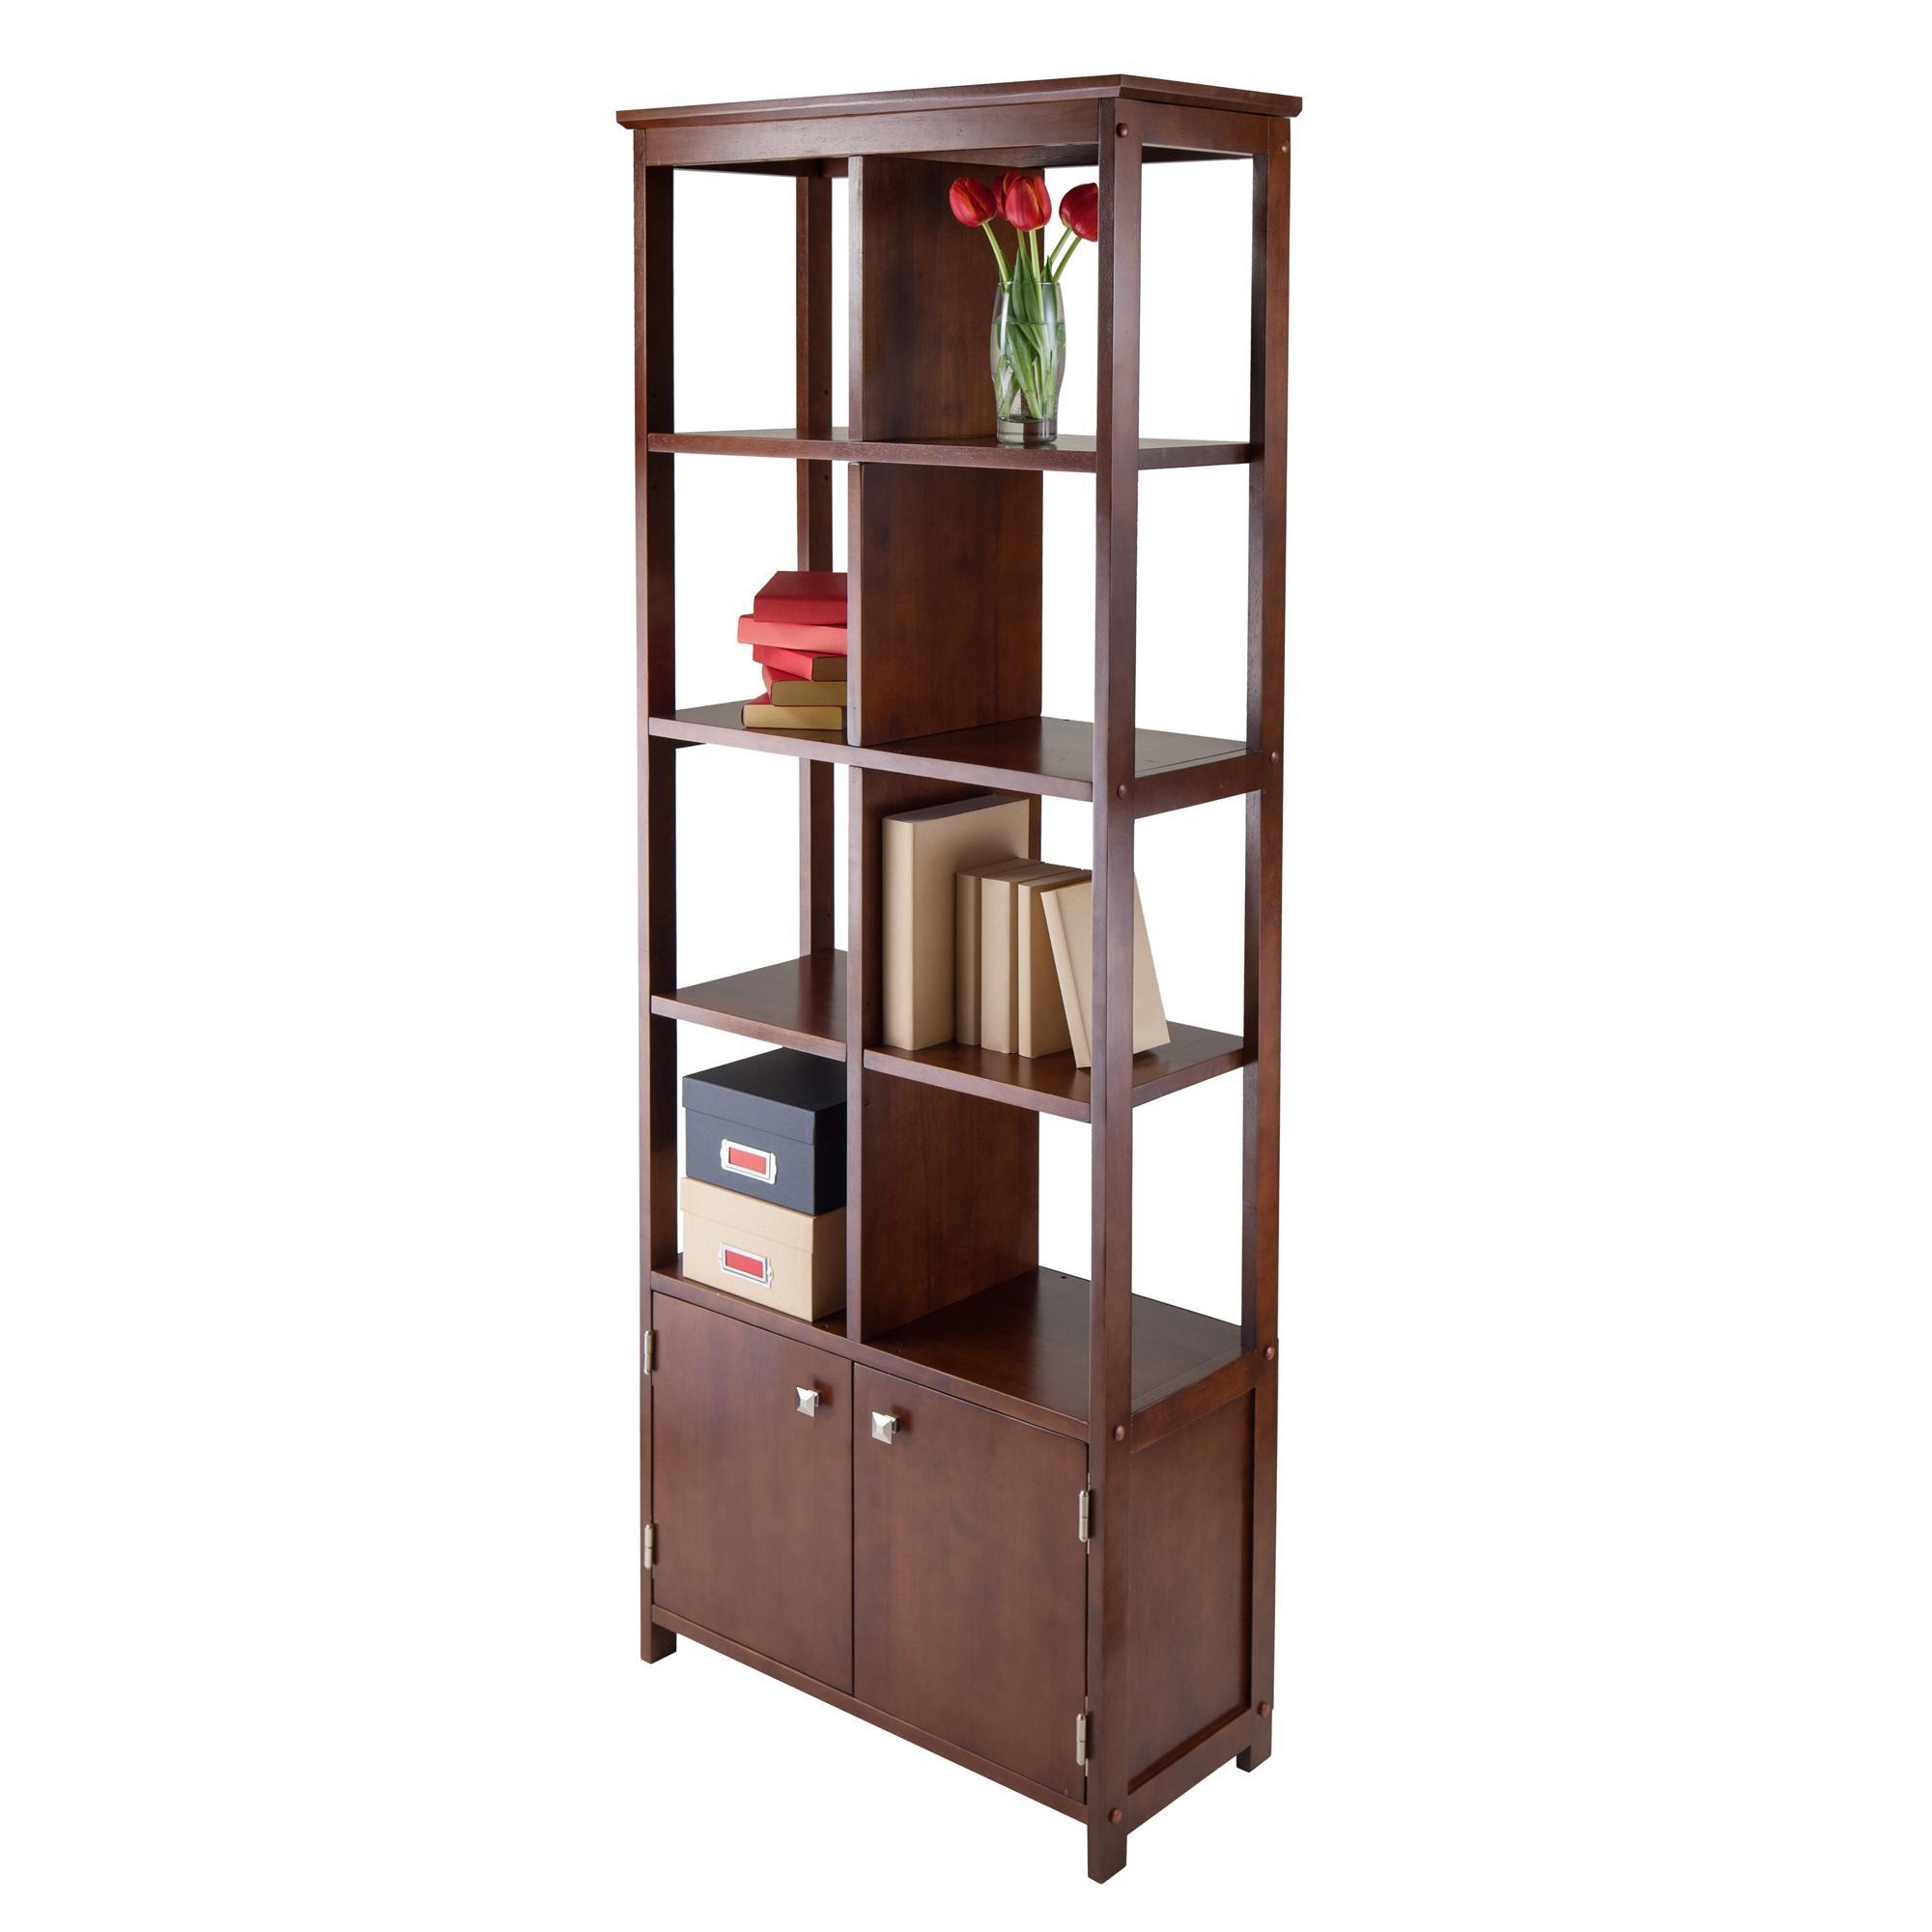 Kitchen Shelf Amazon: Amazon.com: Winsome Wood Oscar Display Shelf: Home & Kitchen